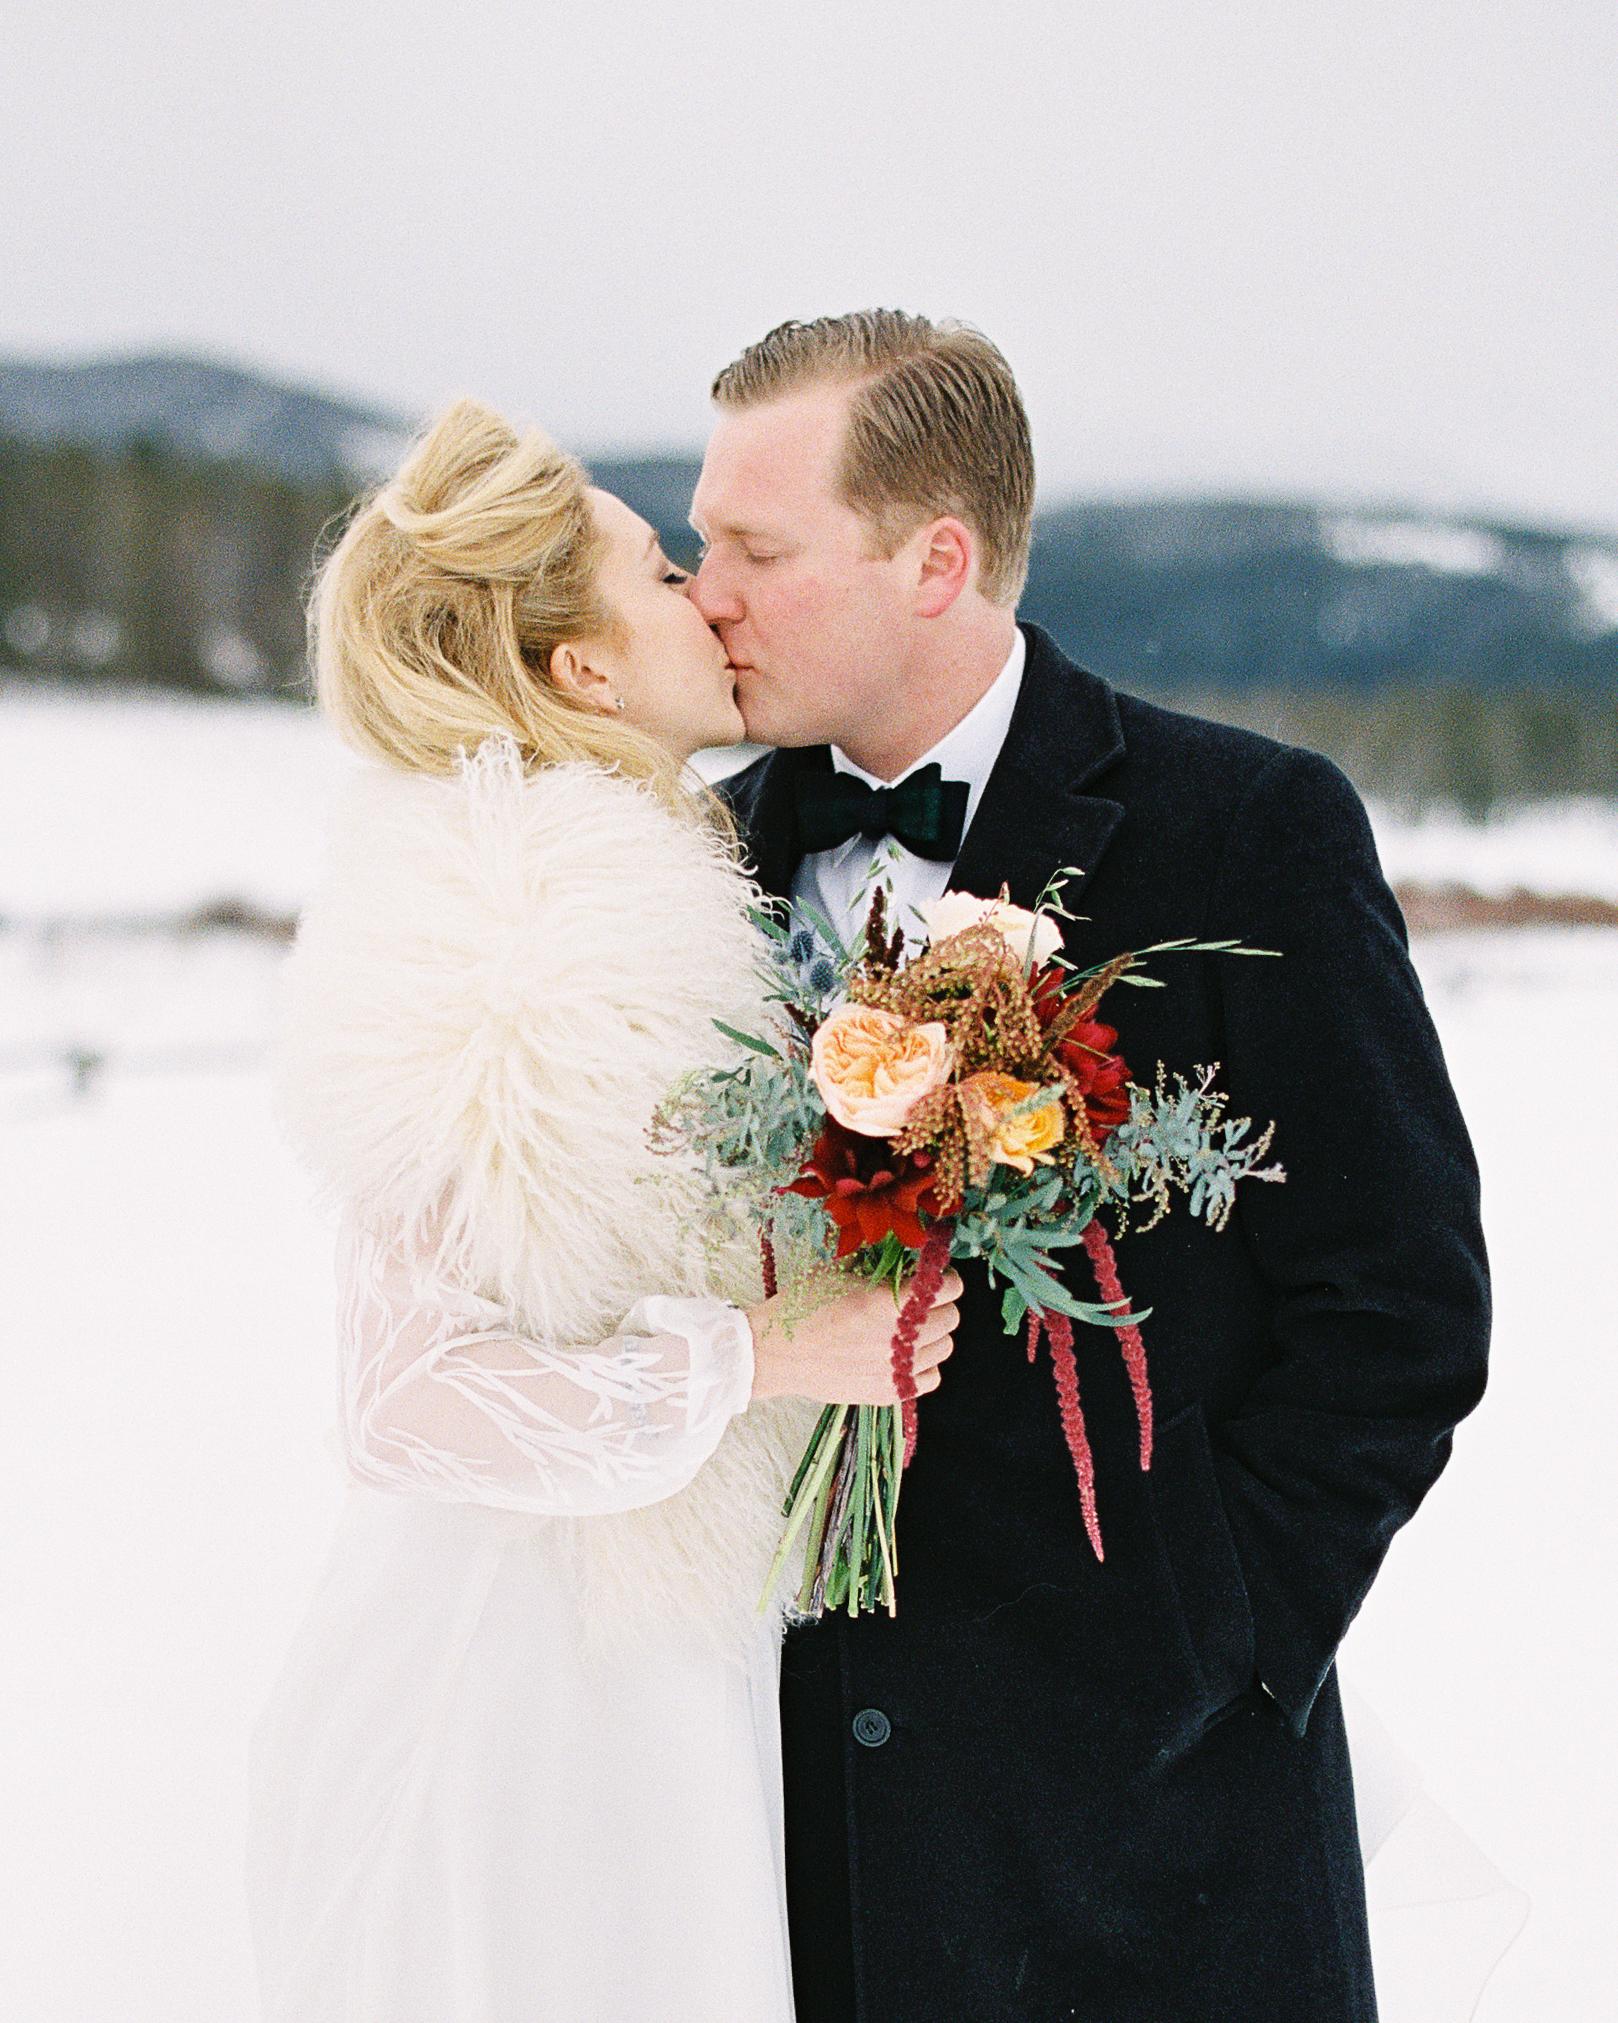 tiffany-nicholas-wedding-portrait2-059-s111339-0714.jpg